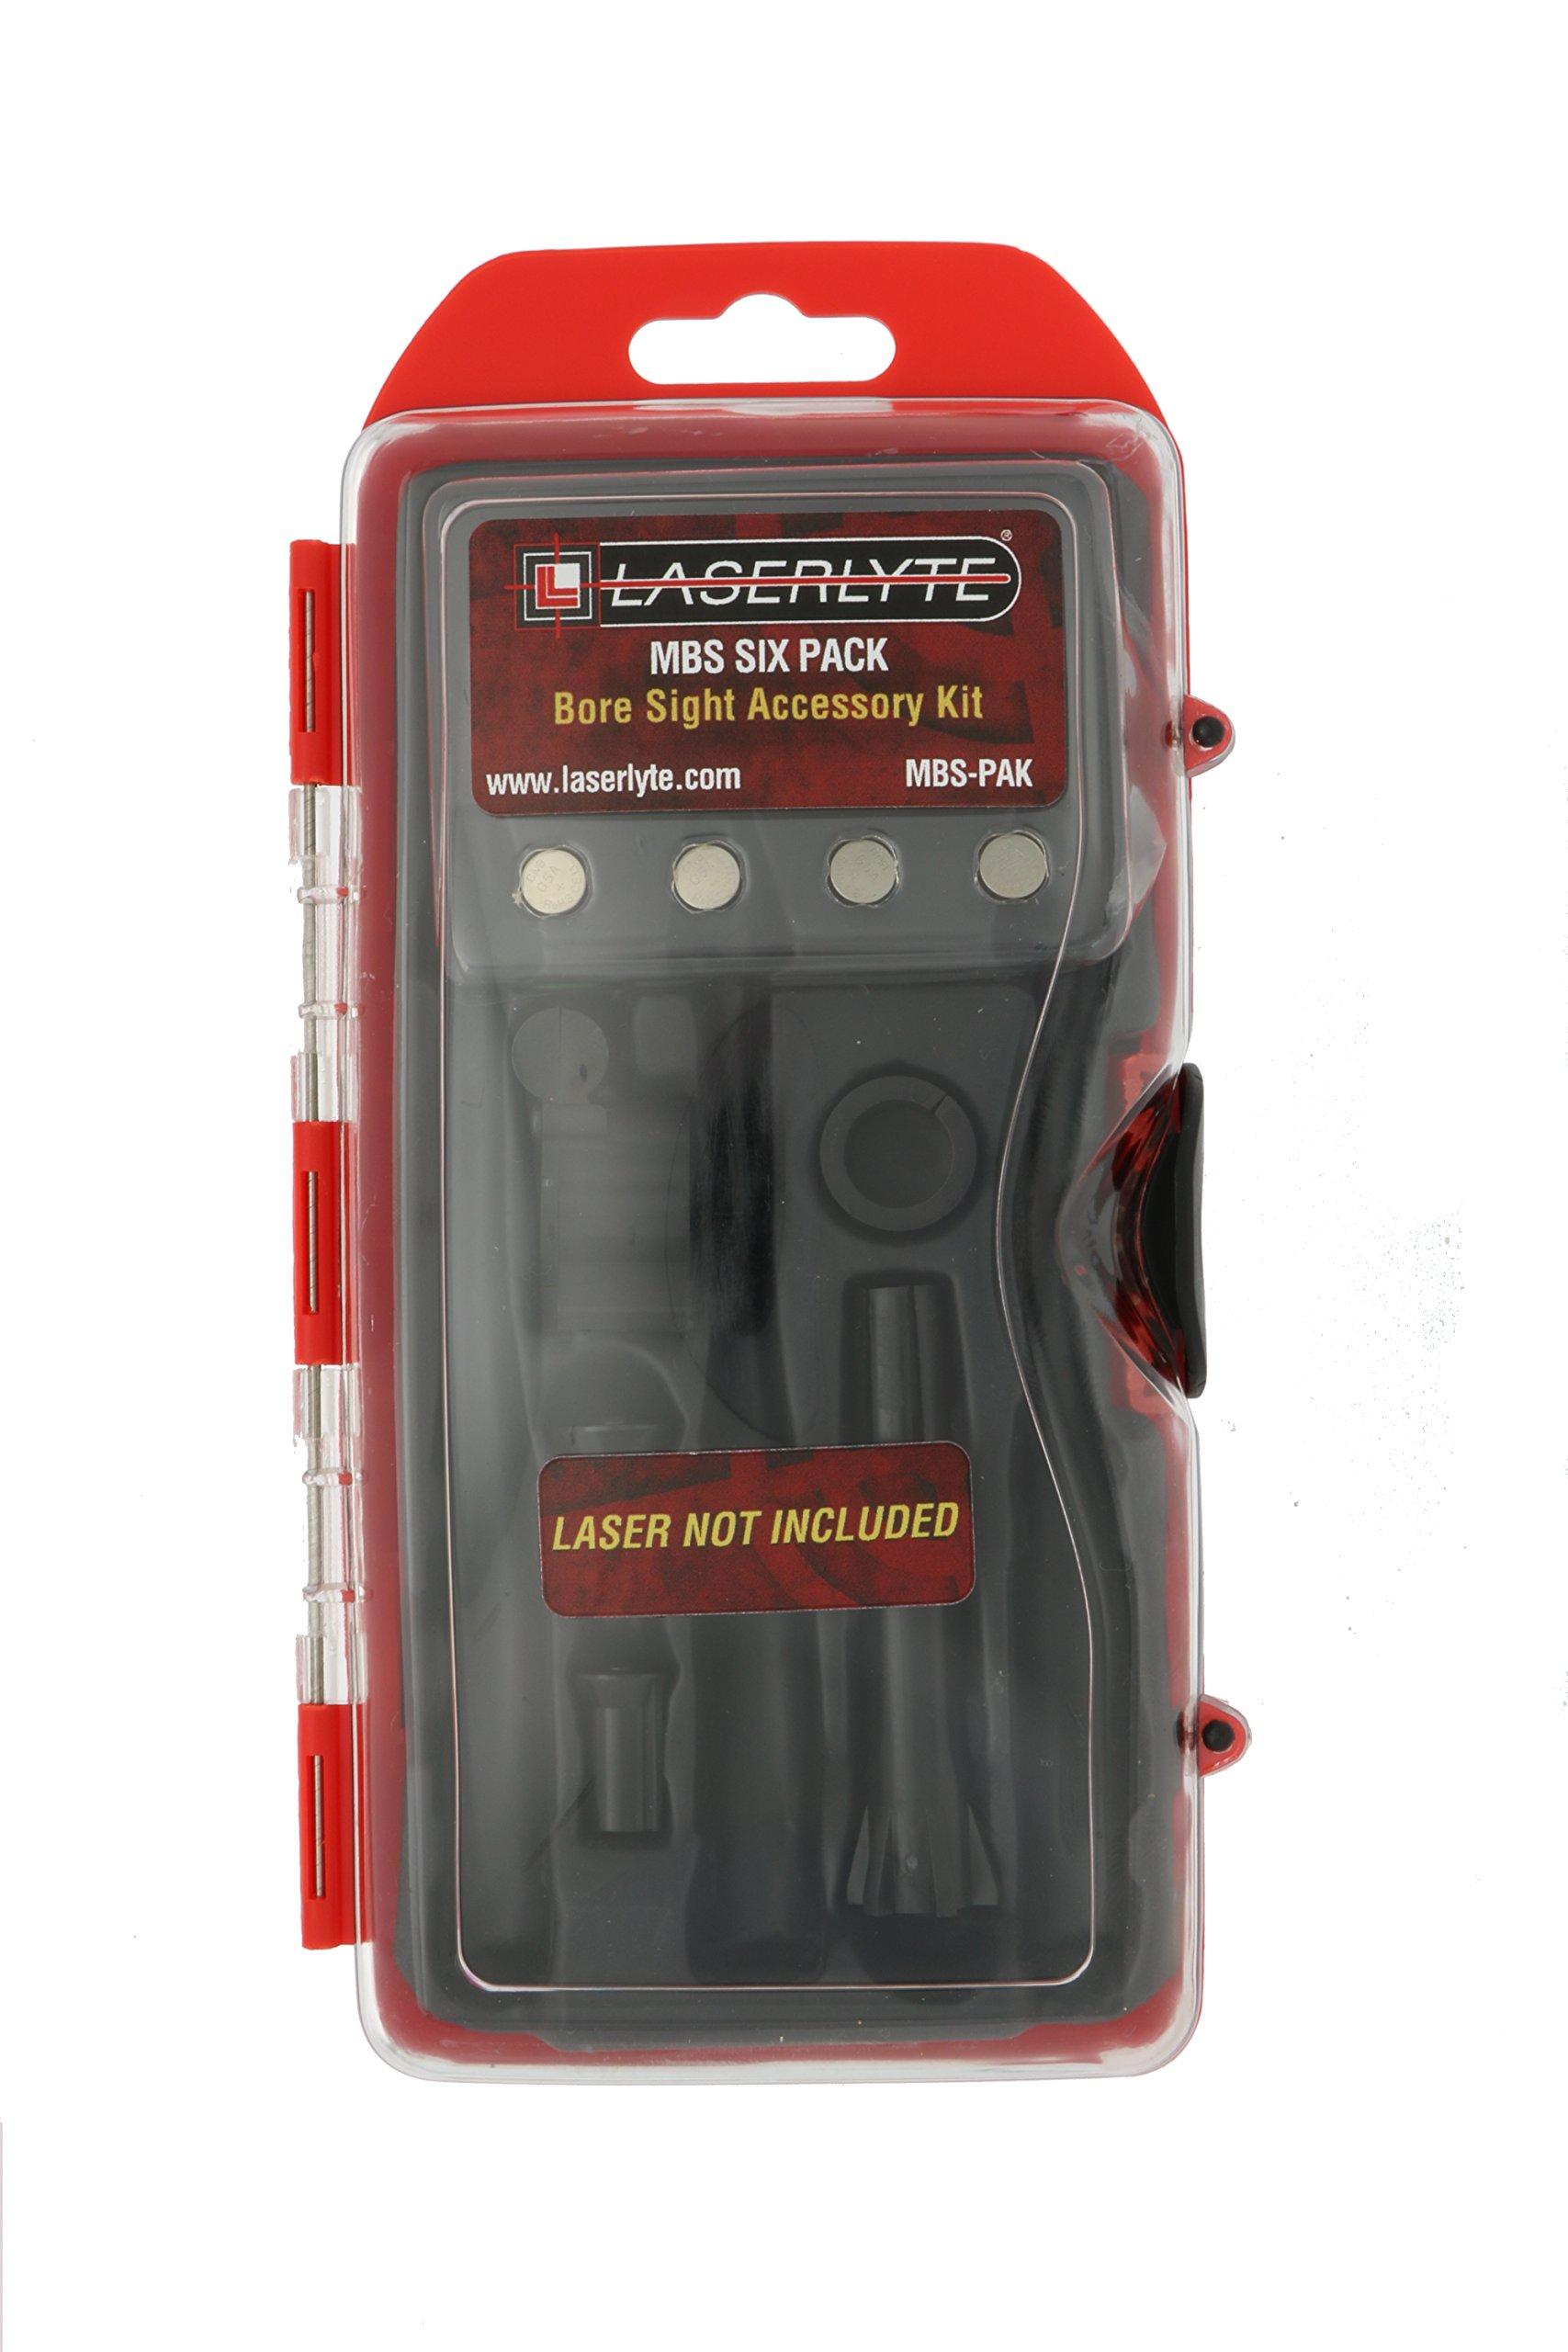 Laser Bore Sight Accessory Kit